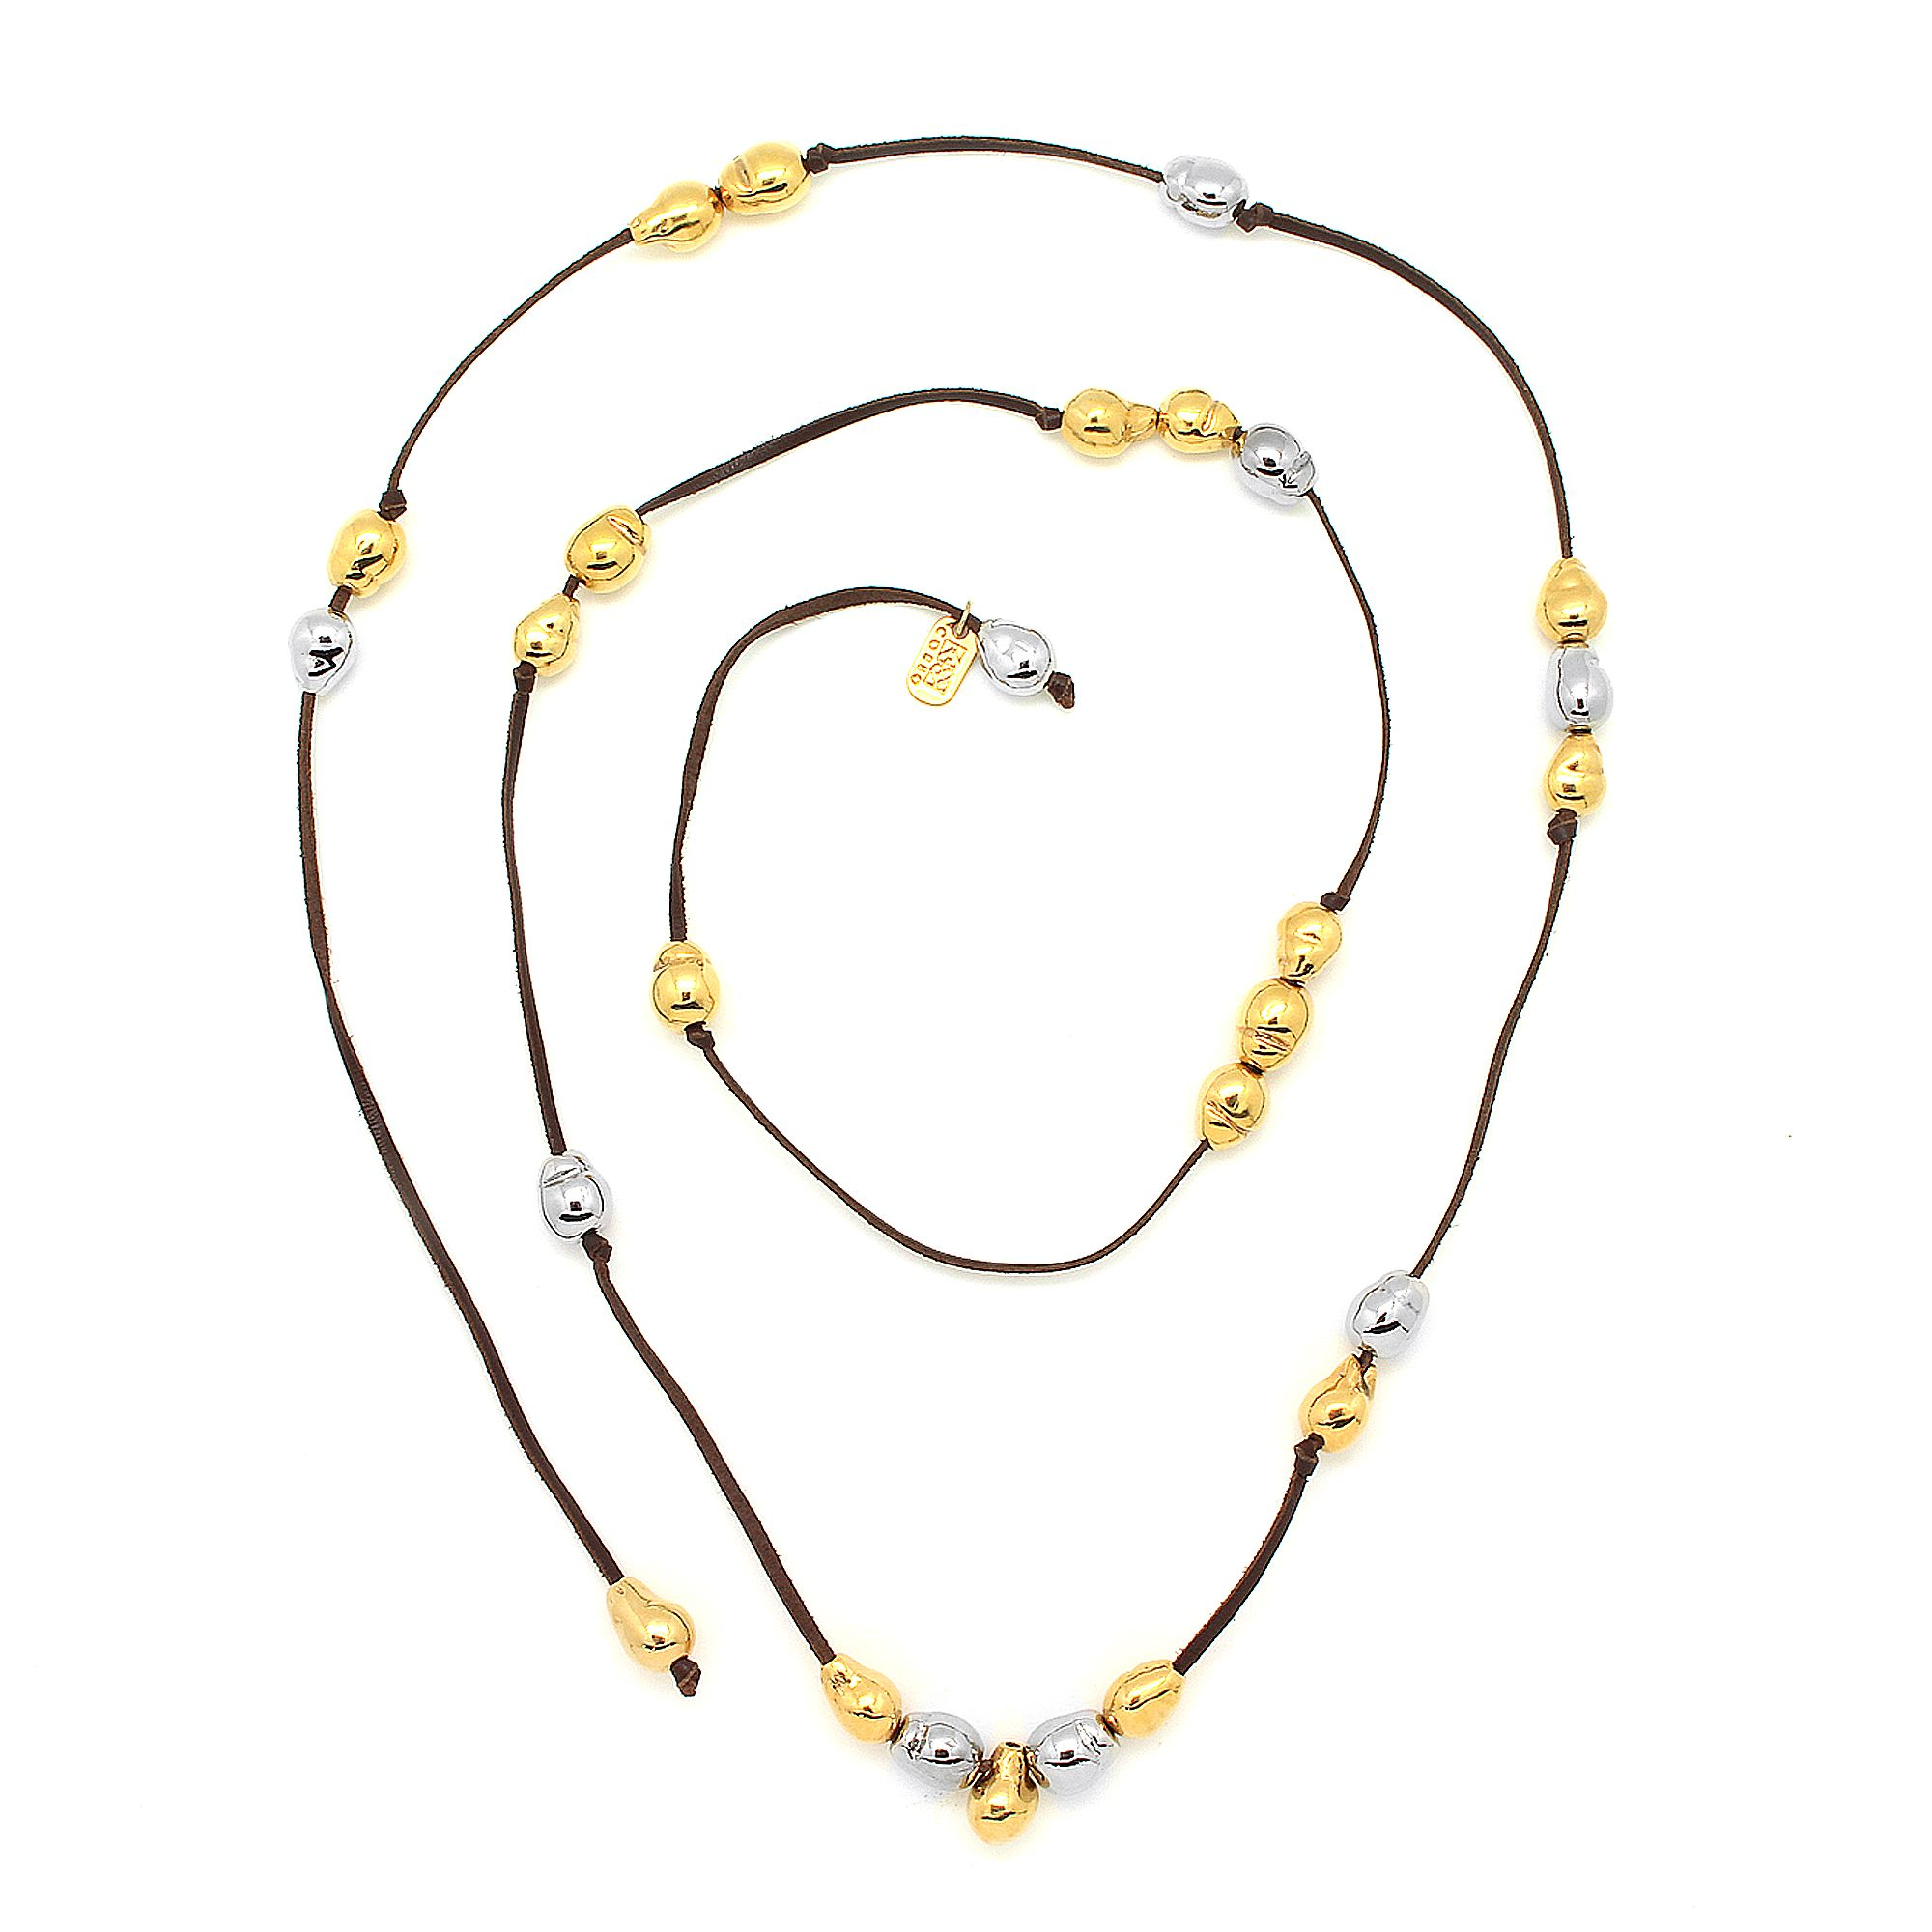 Collar de Tiras de Piel. 18 Perlas en Baño de Oro de 22K y 9 Perlas en Baño de Rodio.